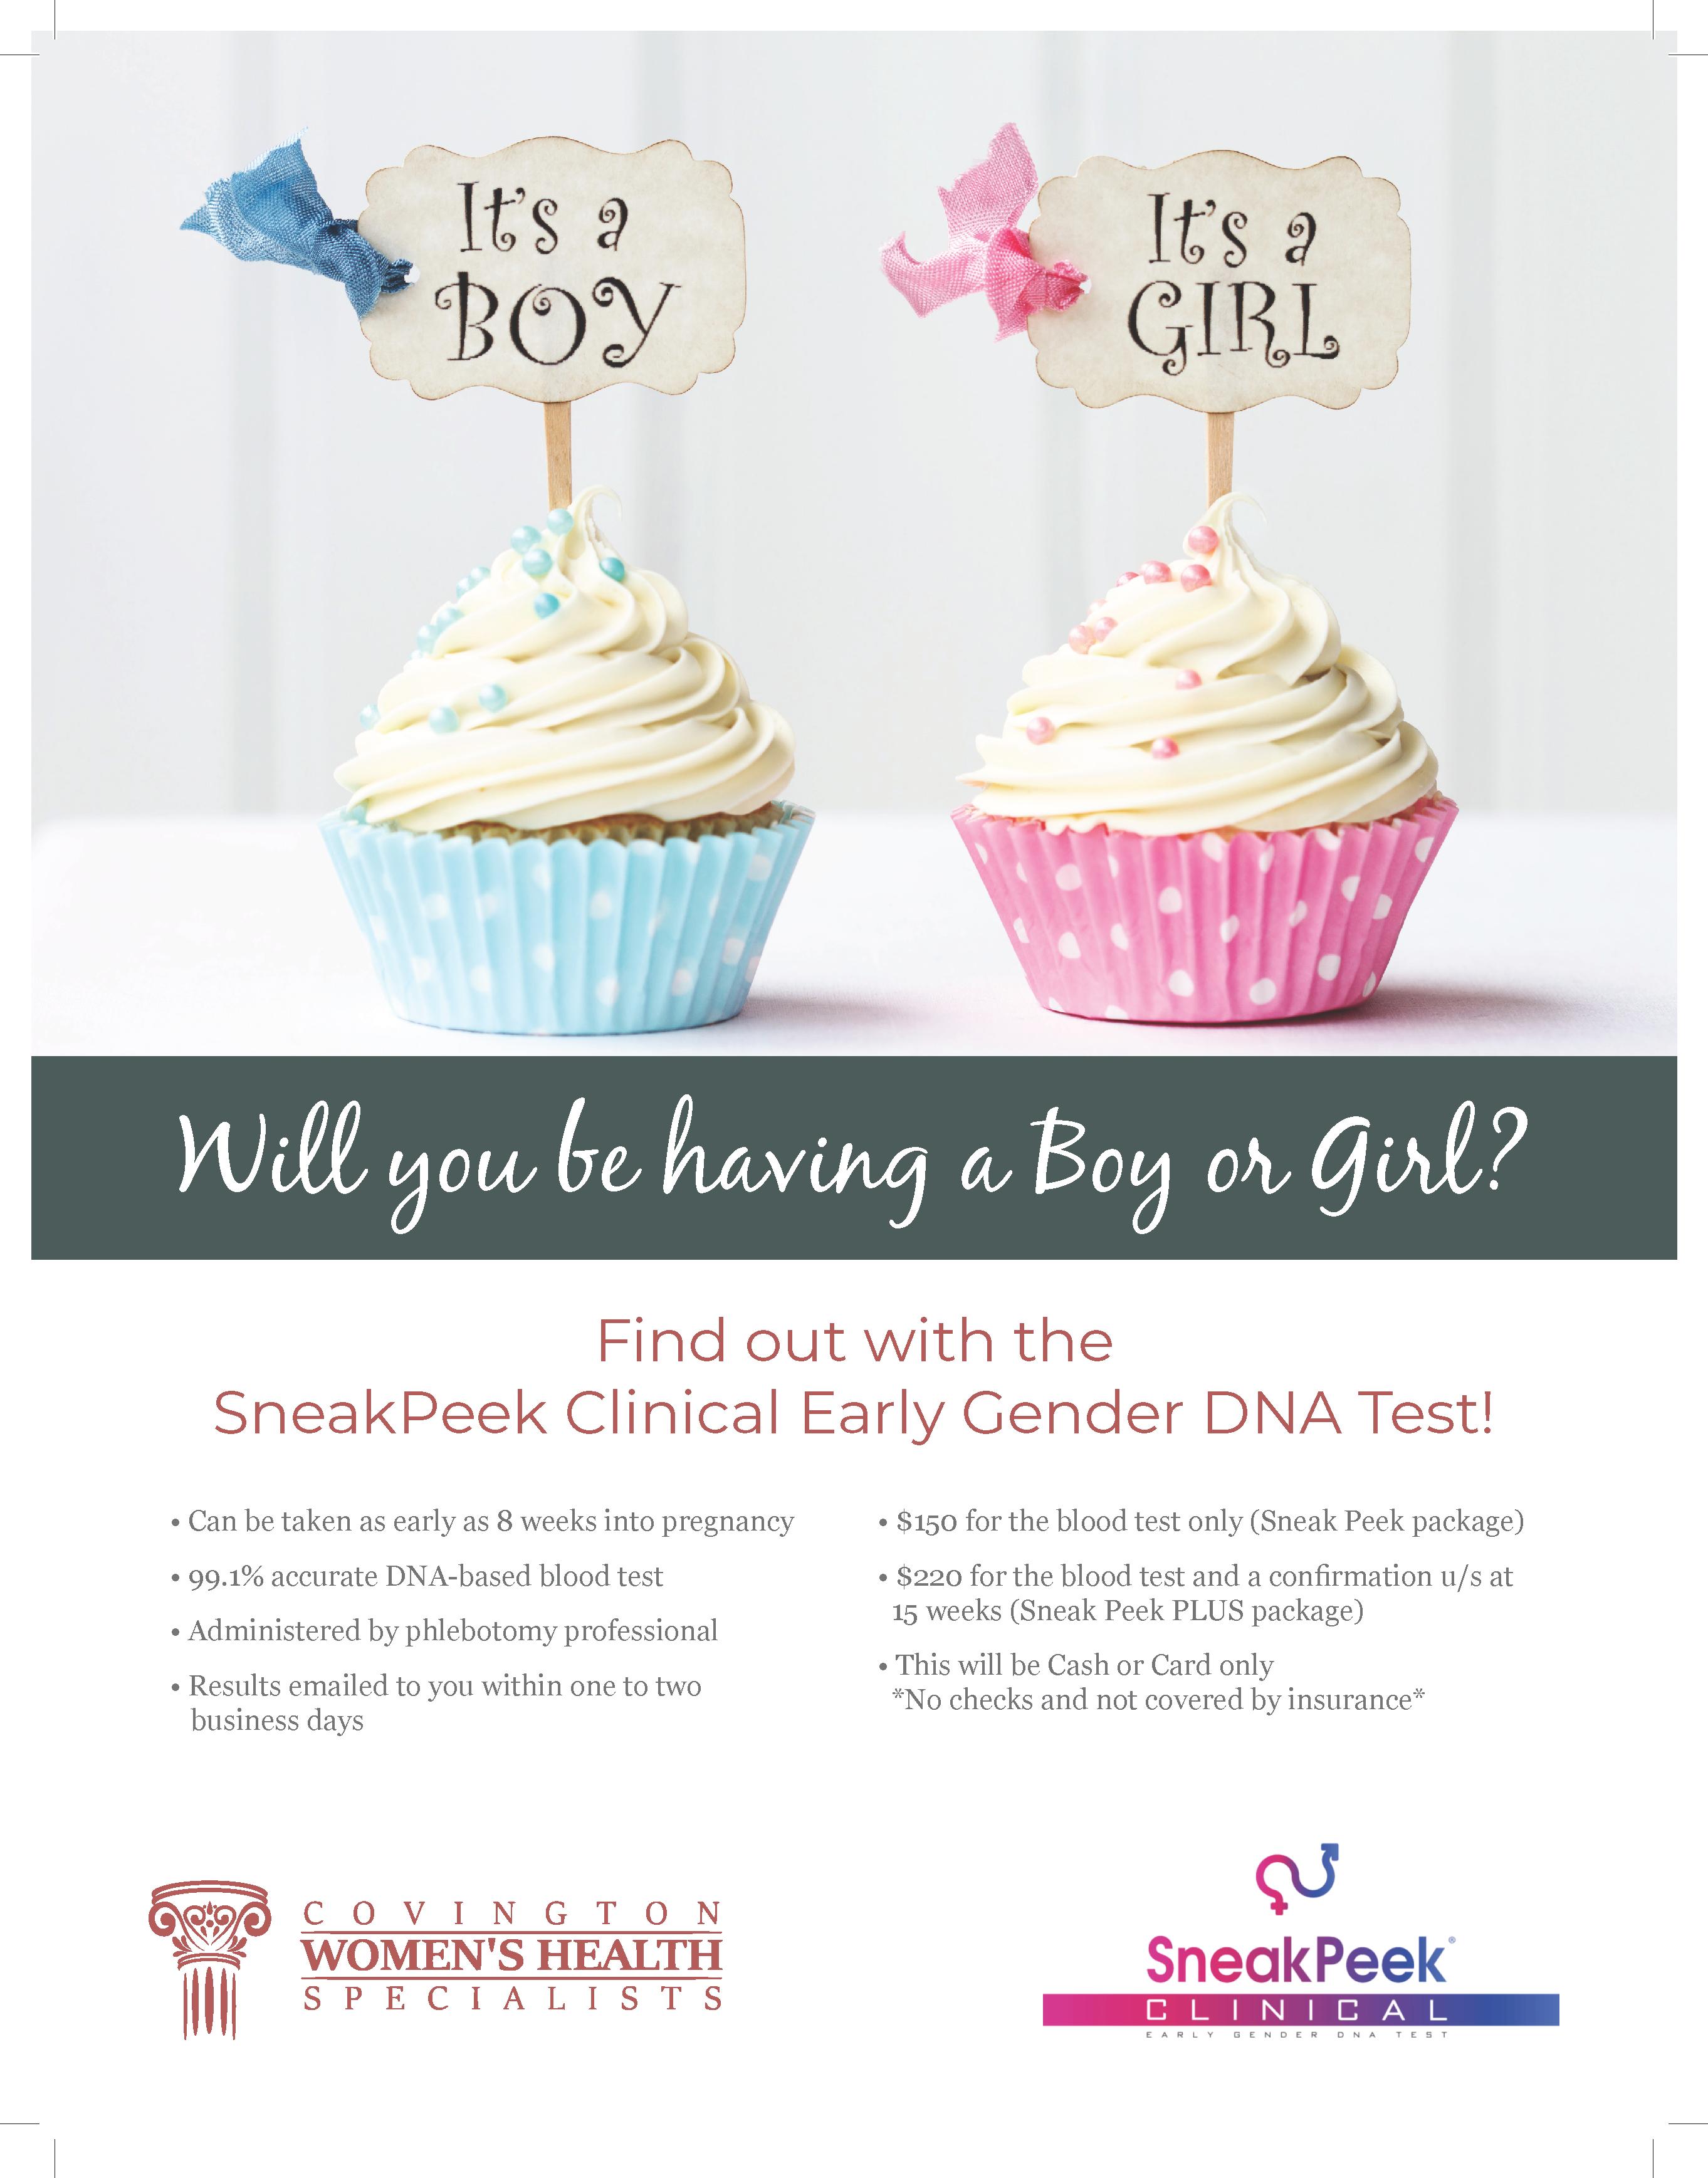 Flyer three of Covington Women's Health gender reveal service.